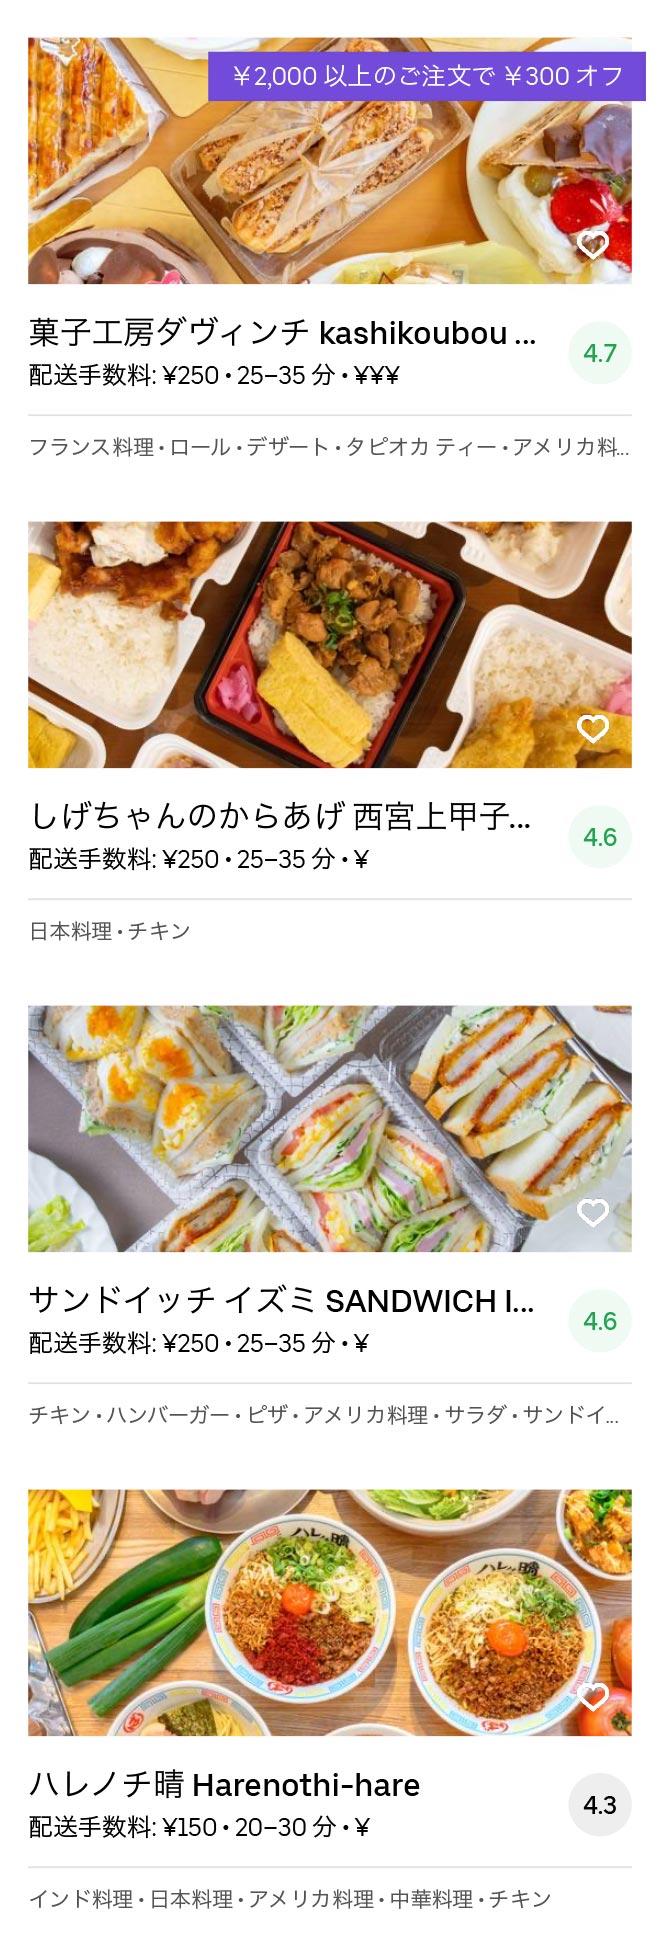 Amagasaki mukonosou menu 2005 11